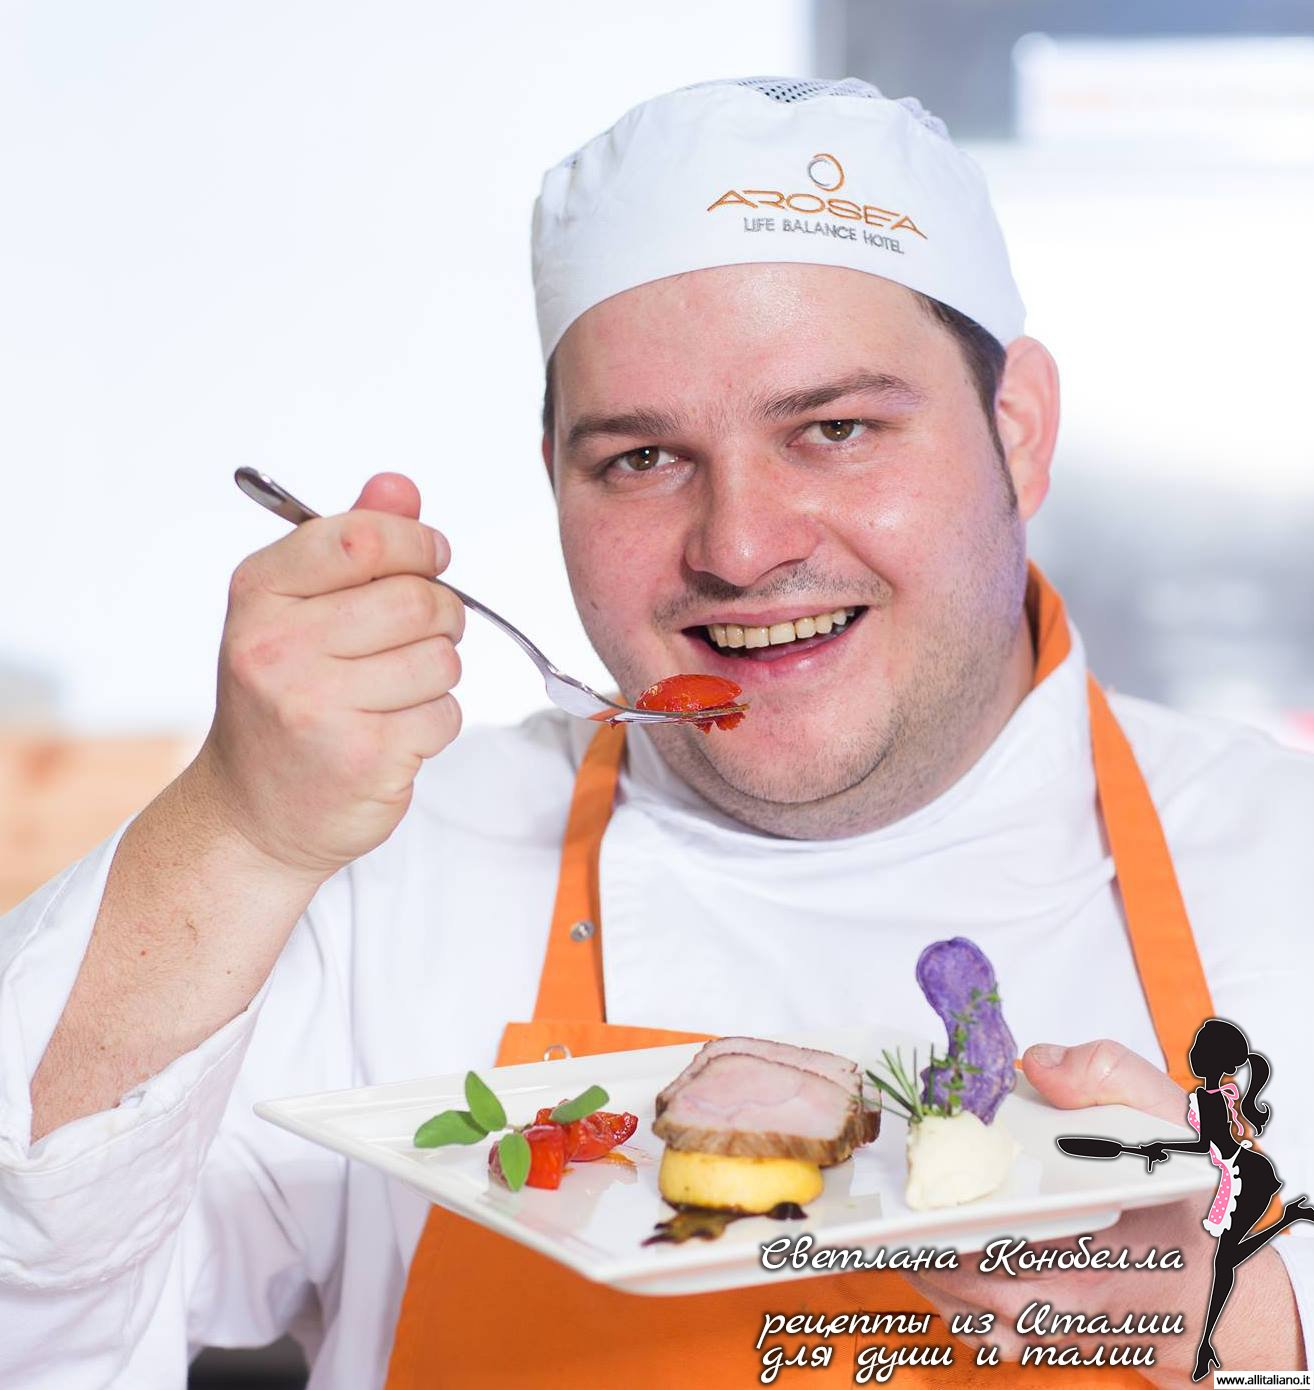 Arosea_chef-povar-italjanskaja-kuhnia-italia-konobella-rezepty-kulinarija-otel (10)